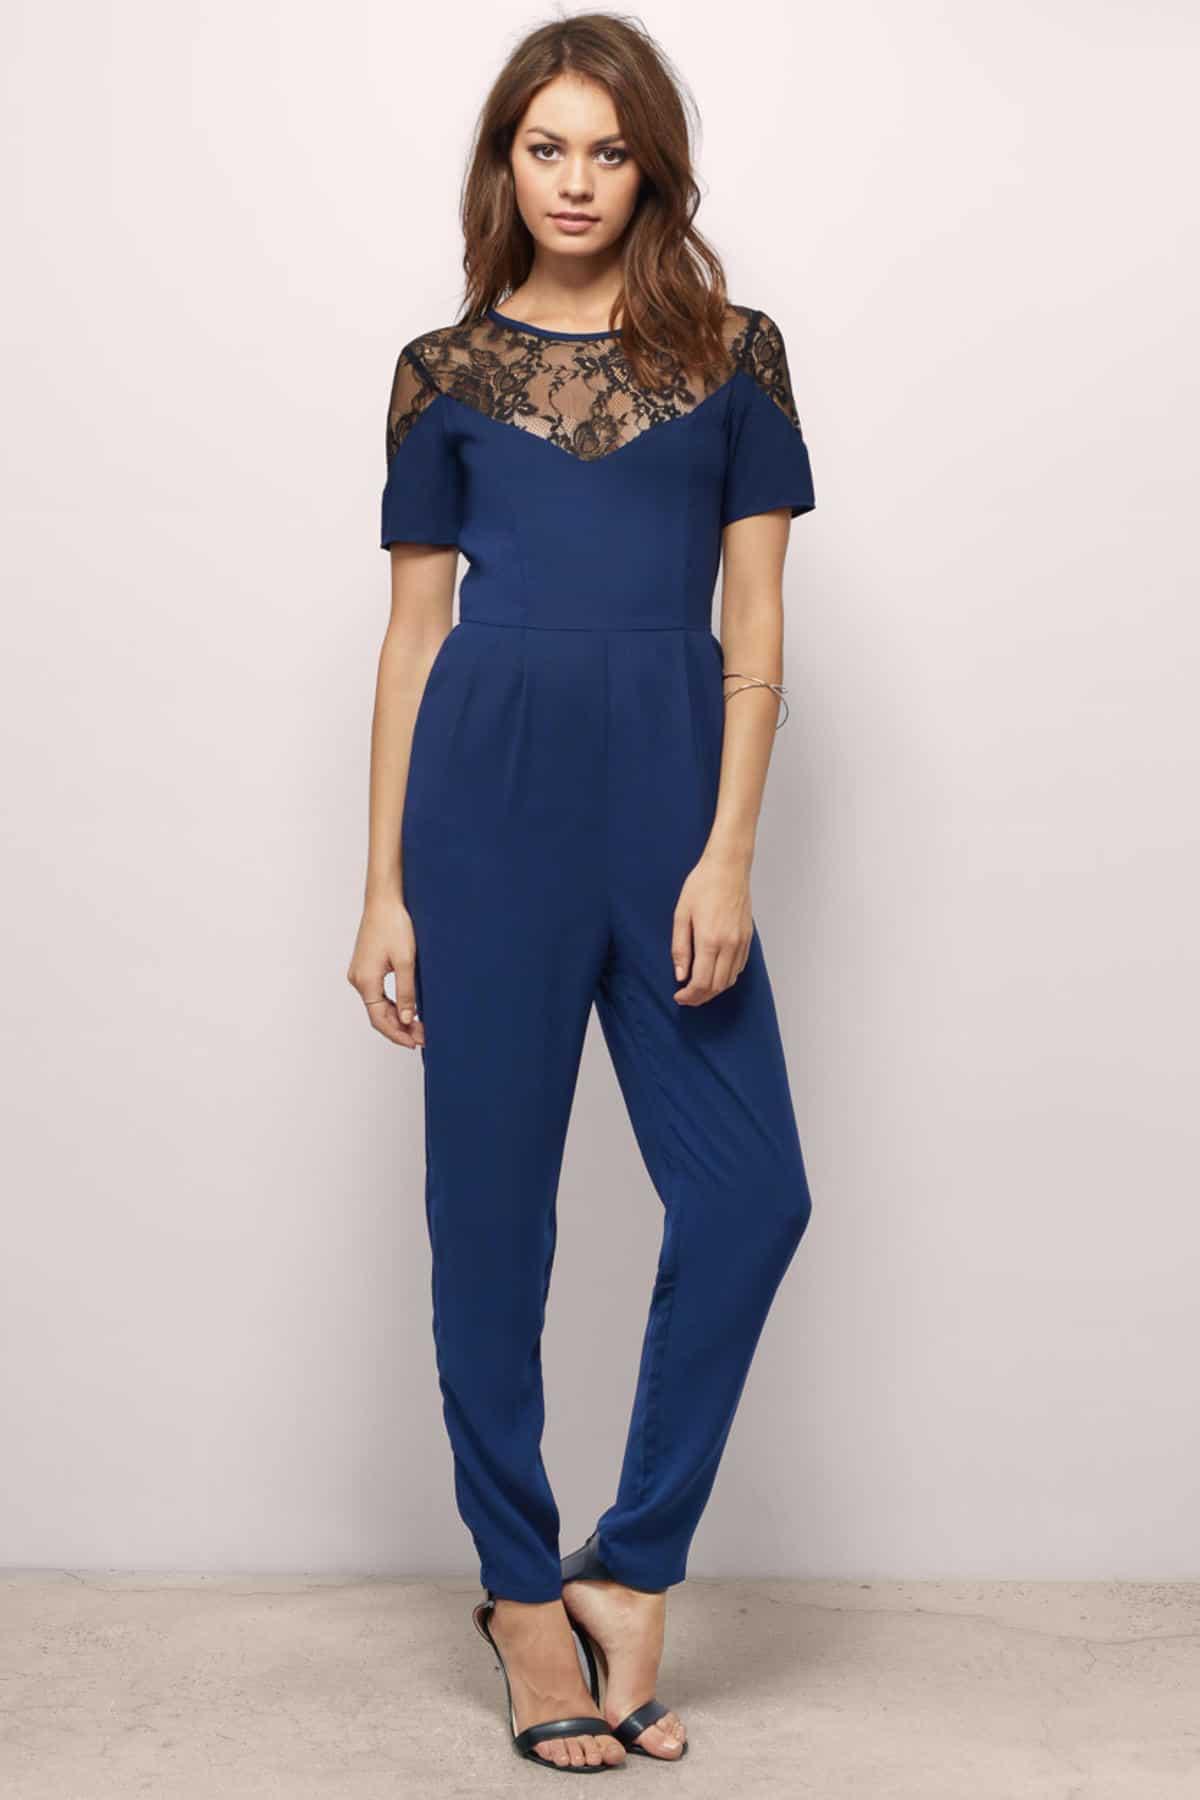 navy-black-mrs-bond-jumpsuit2x